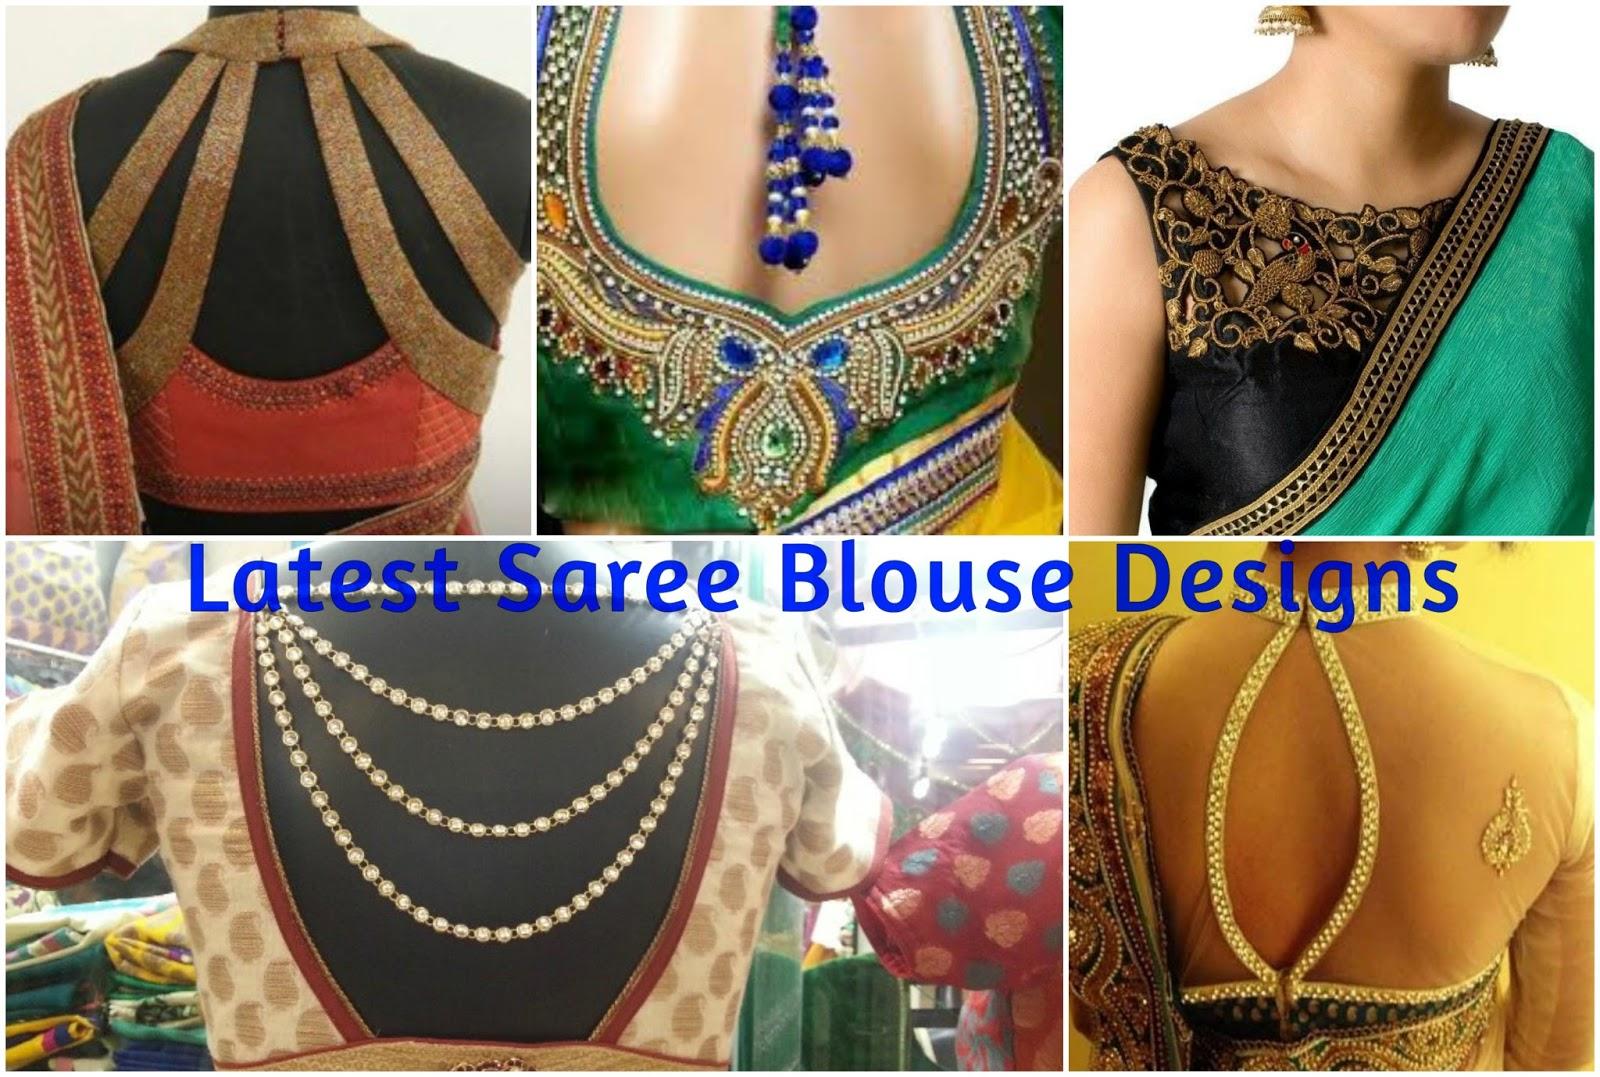 8 Modern Saree Blouse Designs | Ashion Fashion